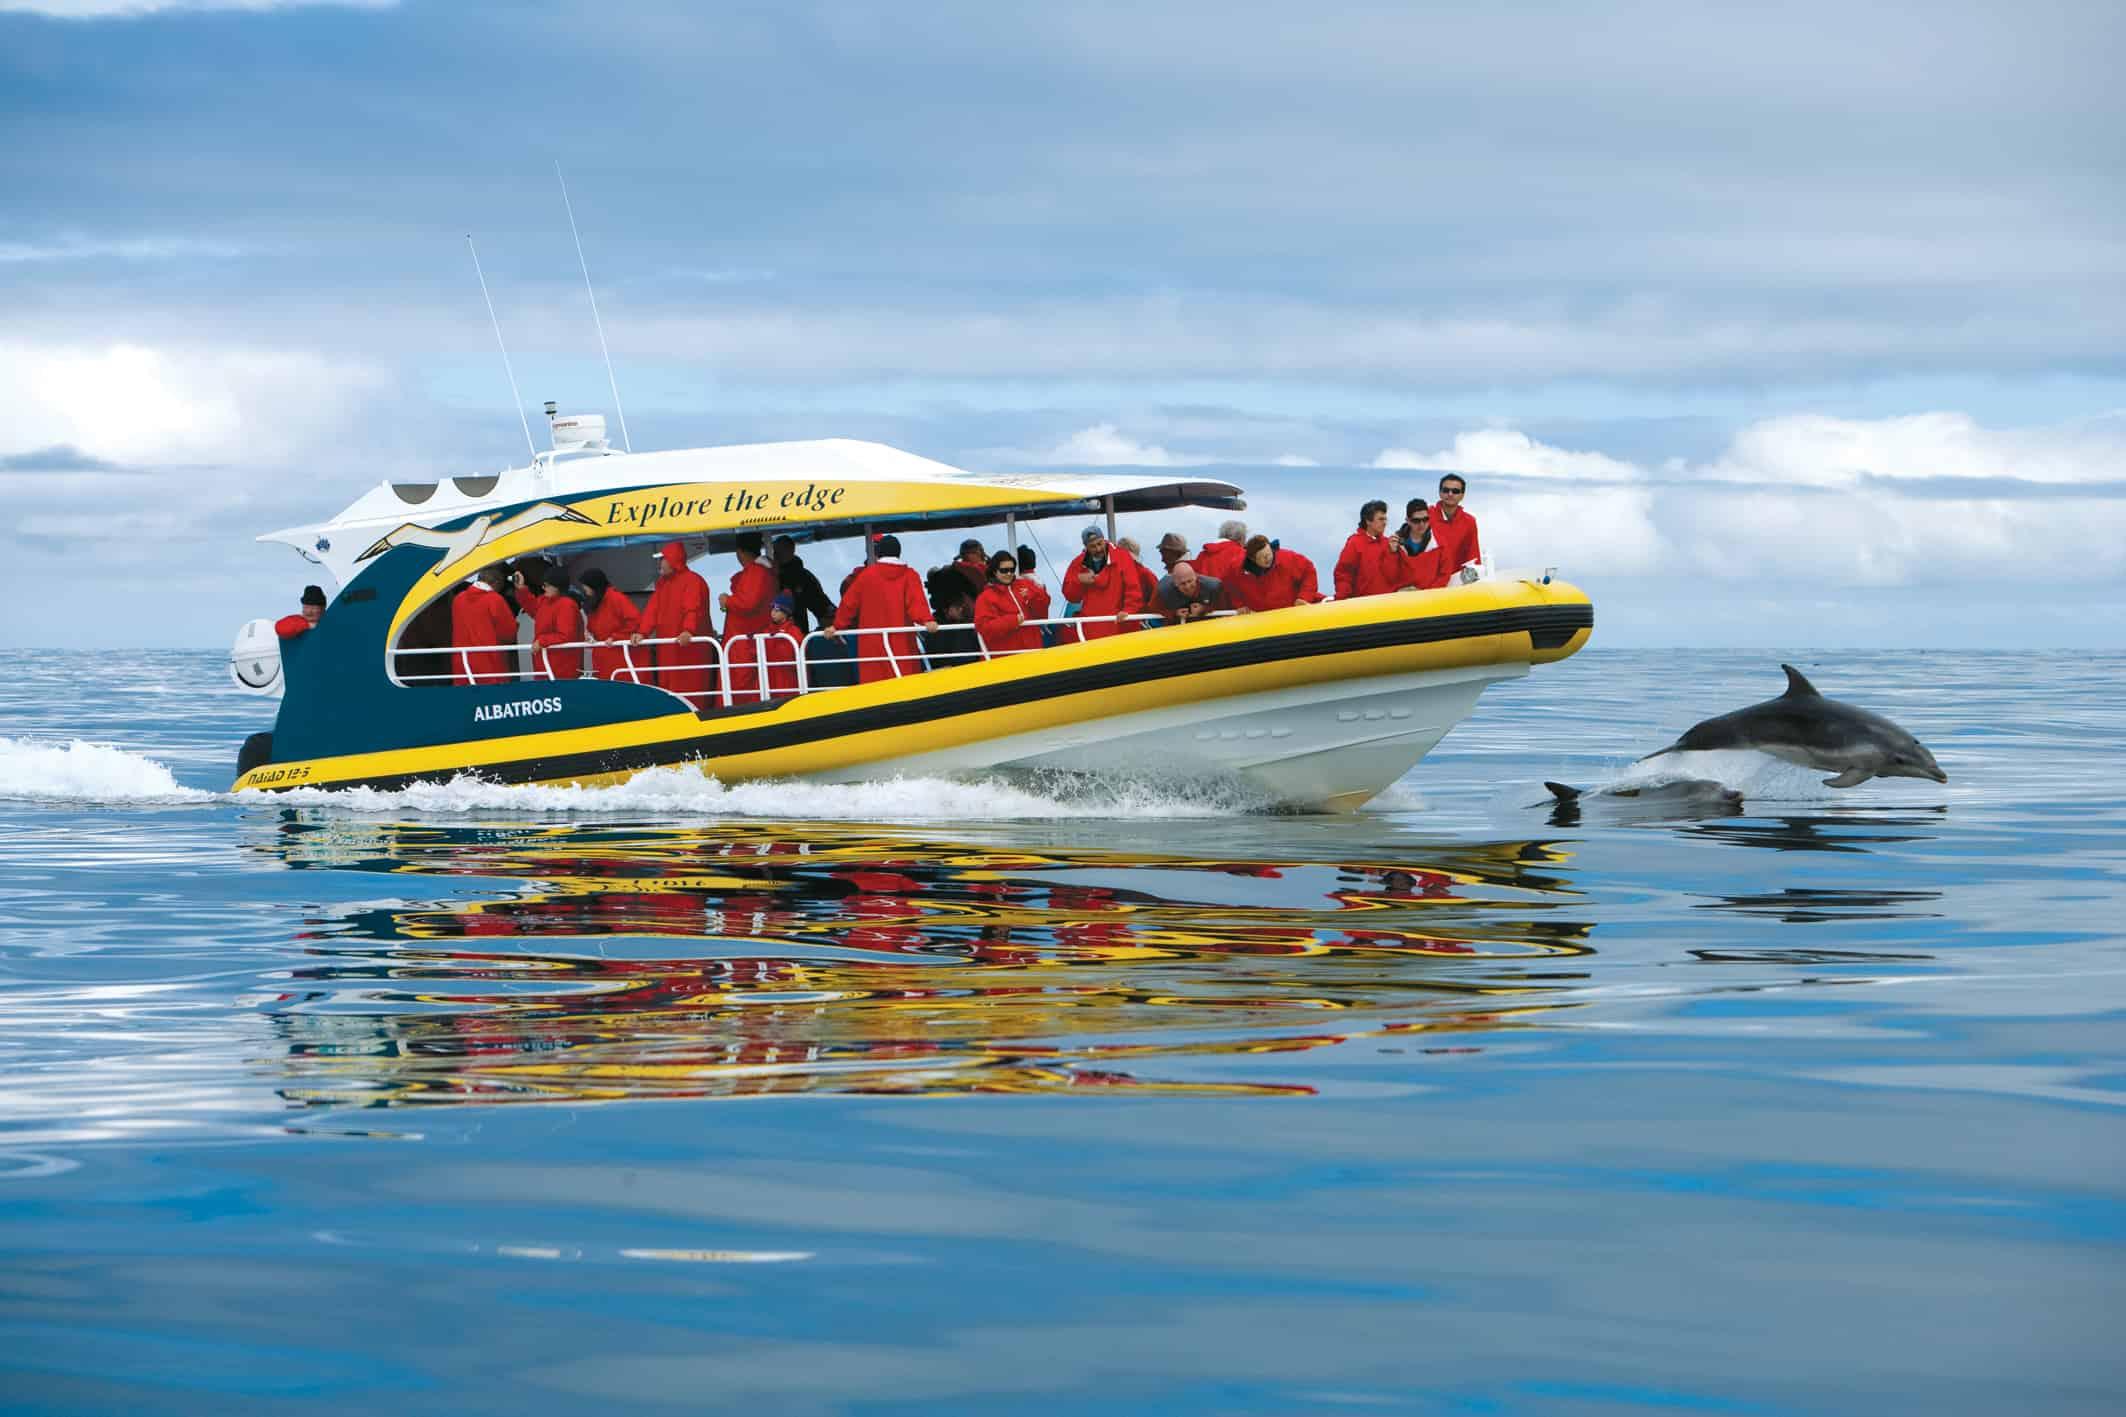 boat-300dpi